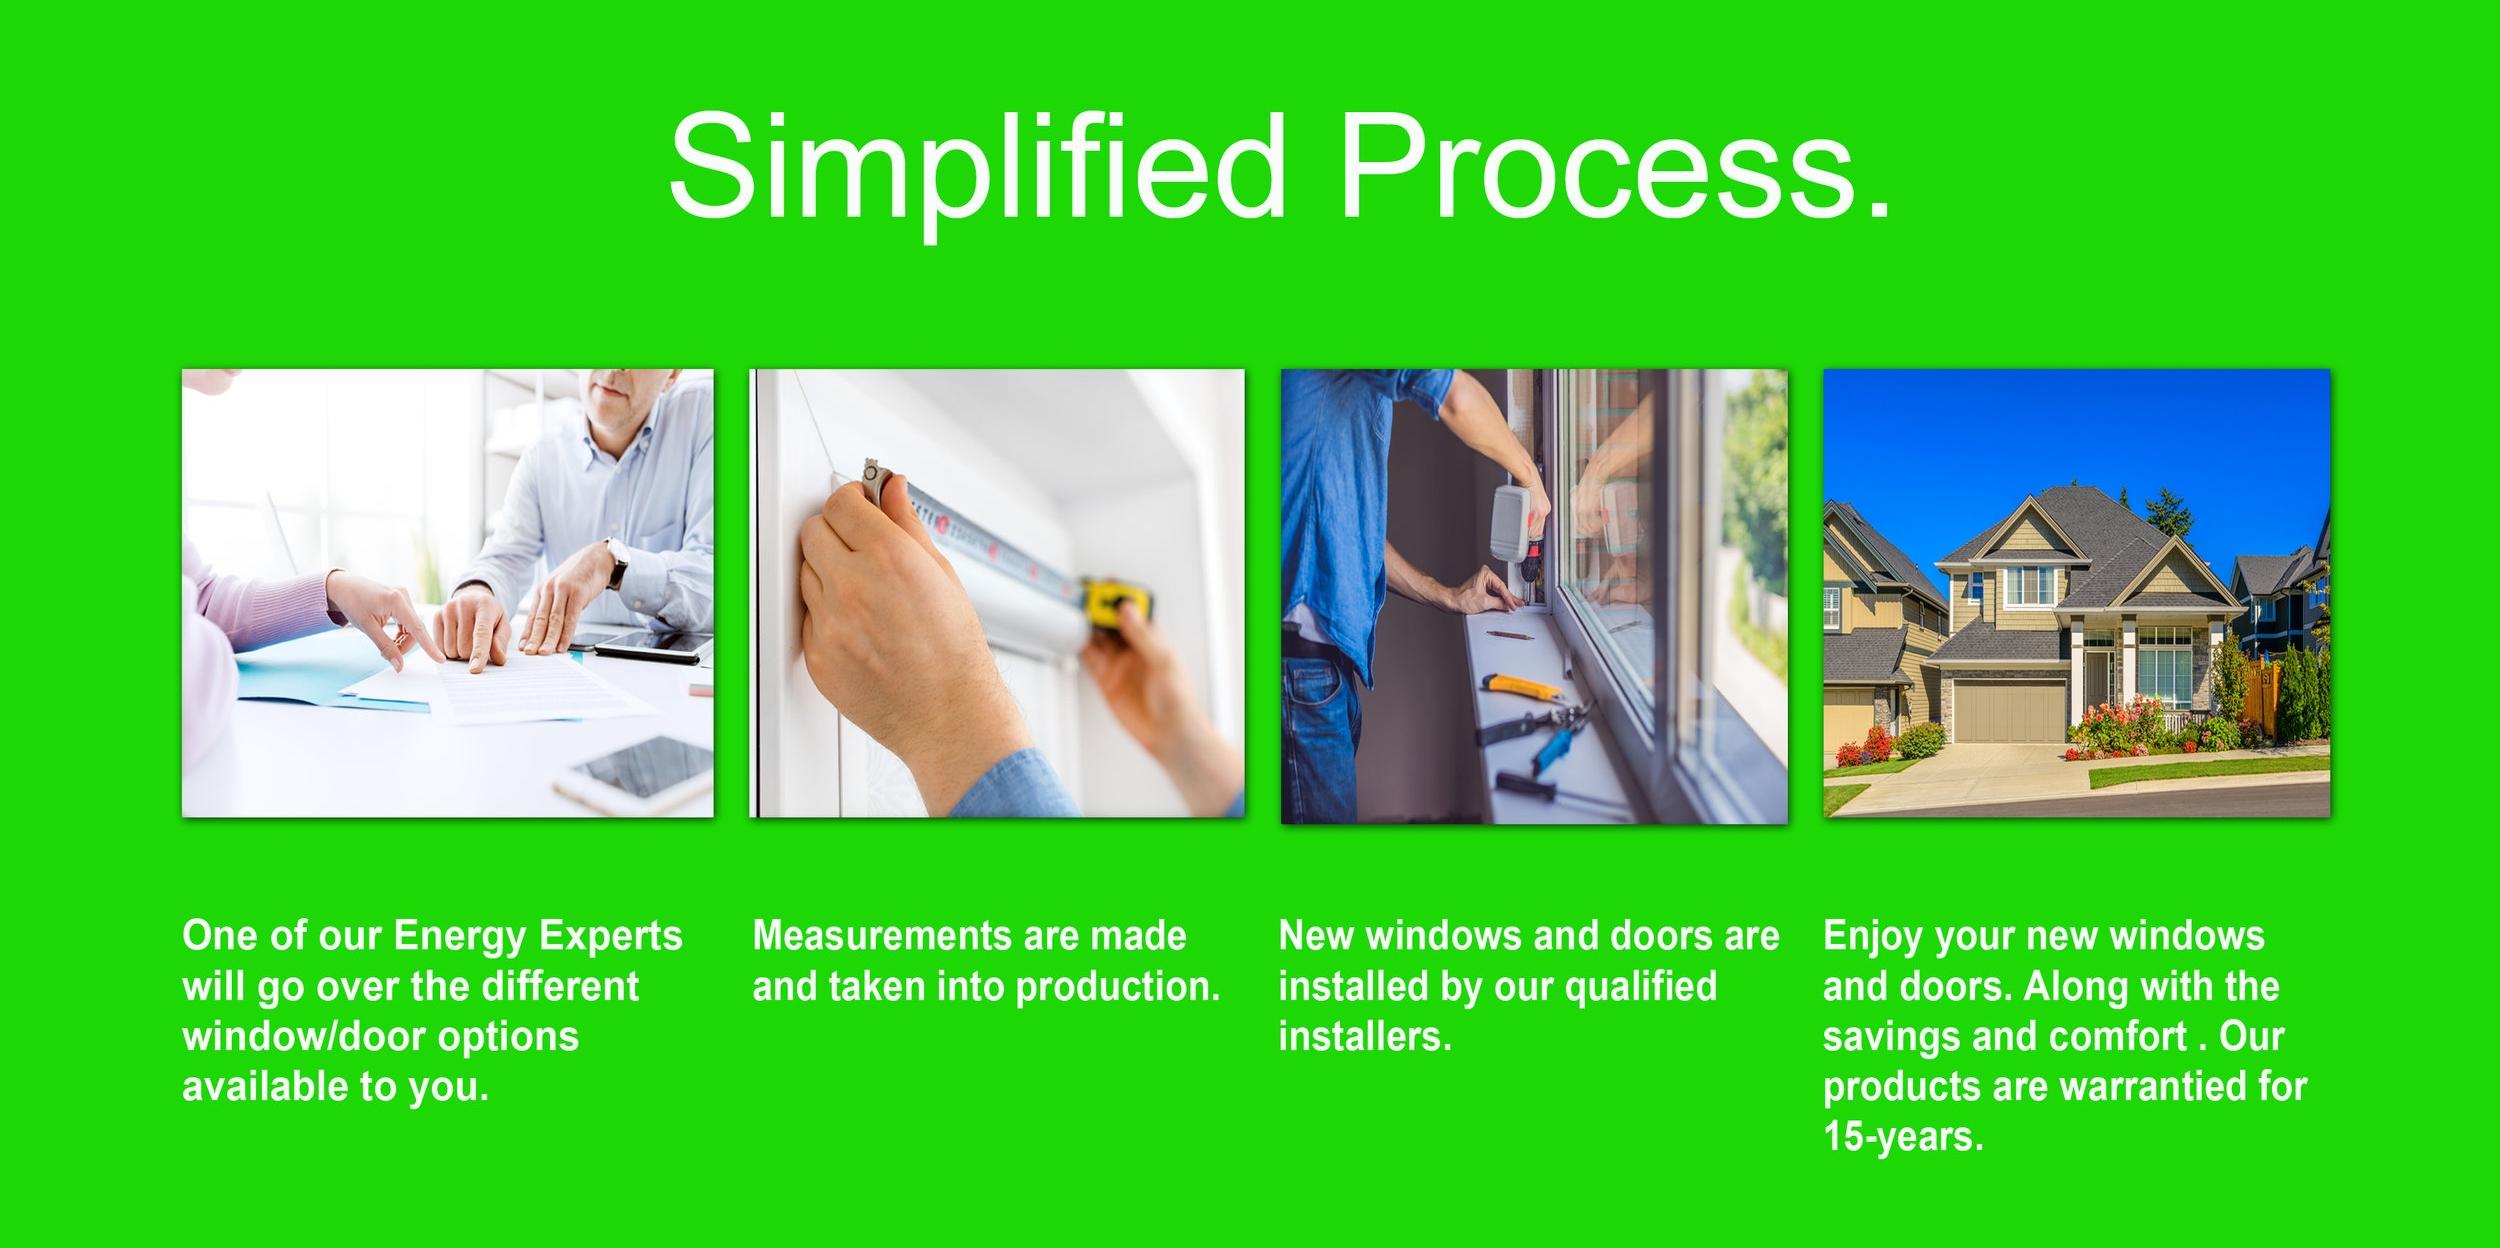 Simplified Process Web 7.jpg